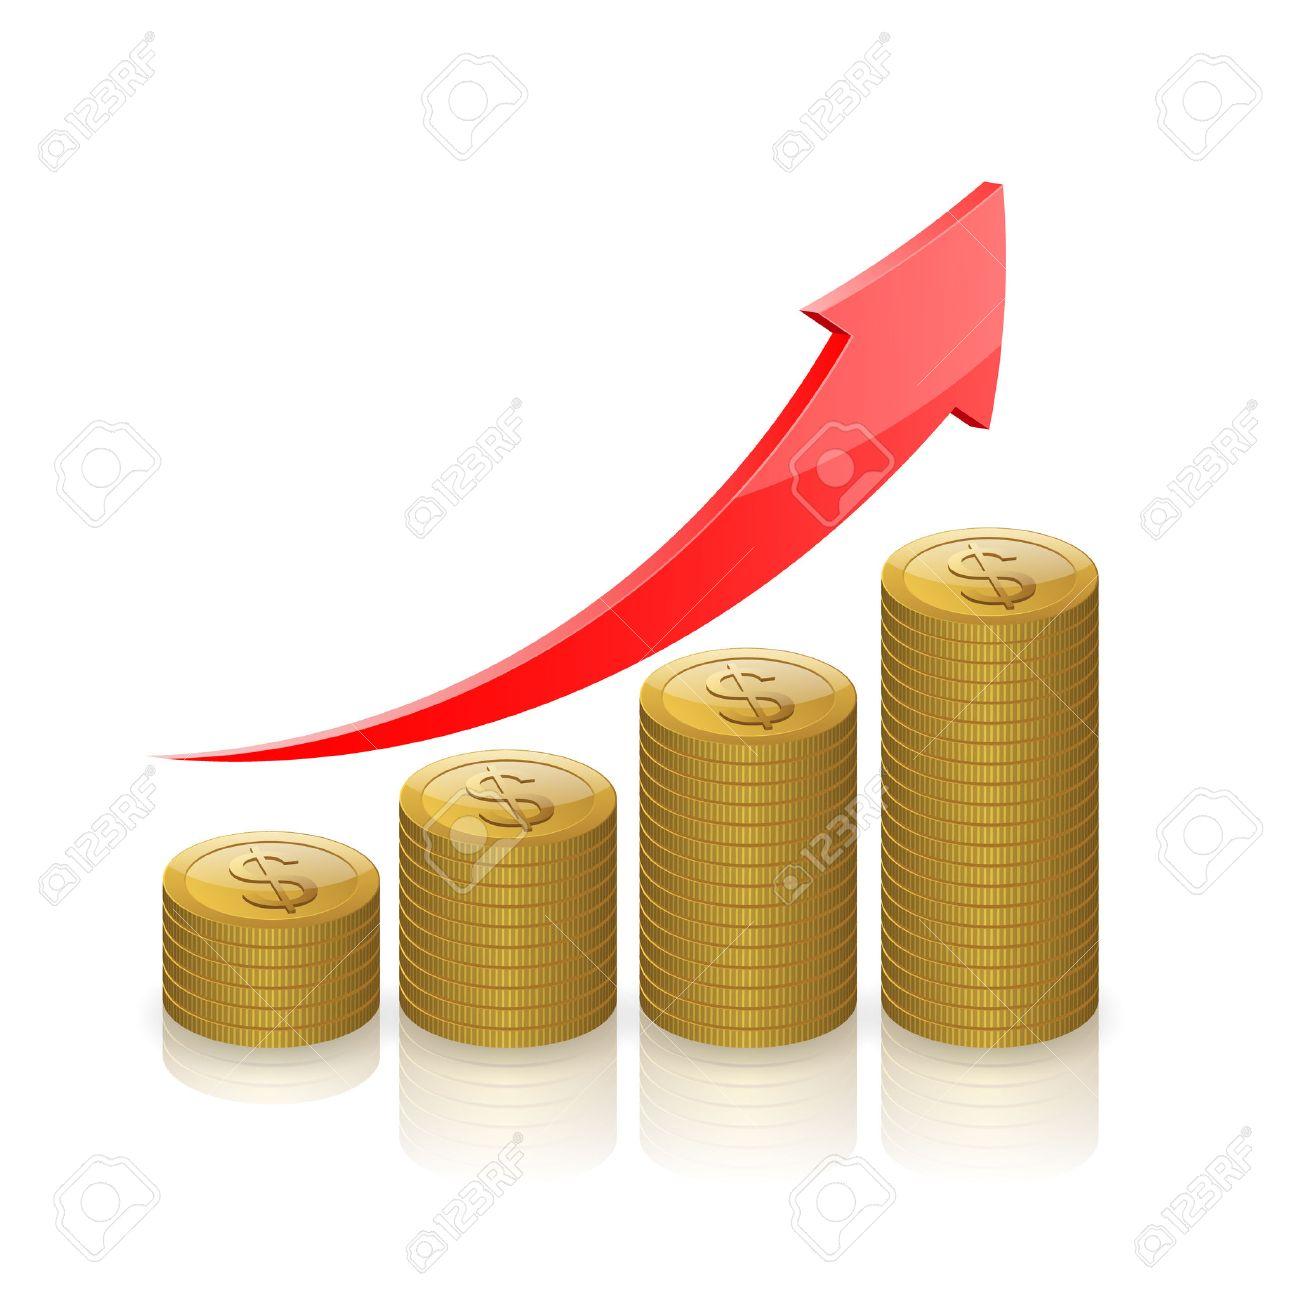 Gold coins money,Business graph icon, Business success concept. - 50074171